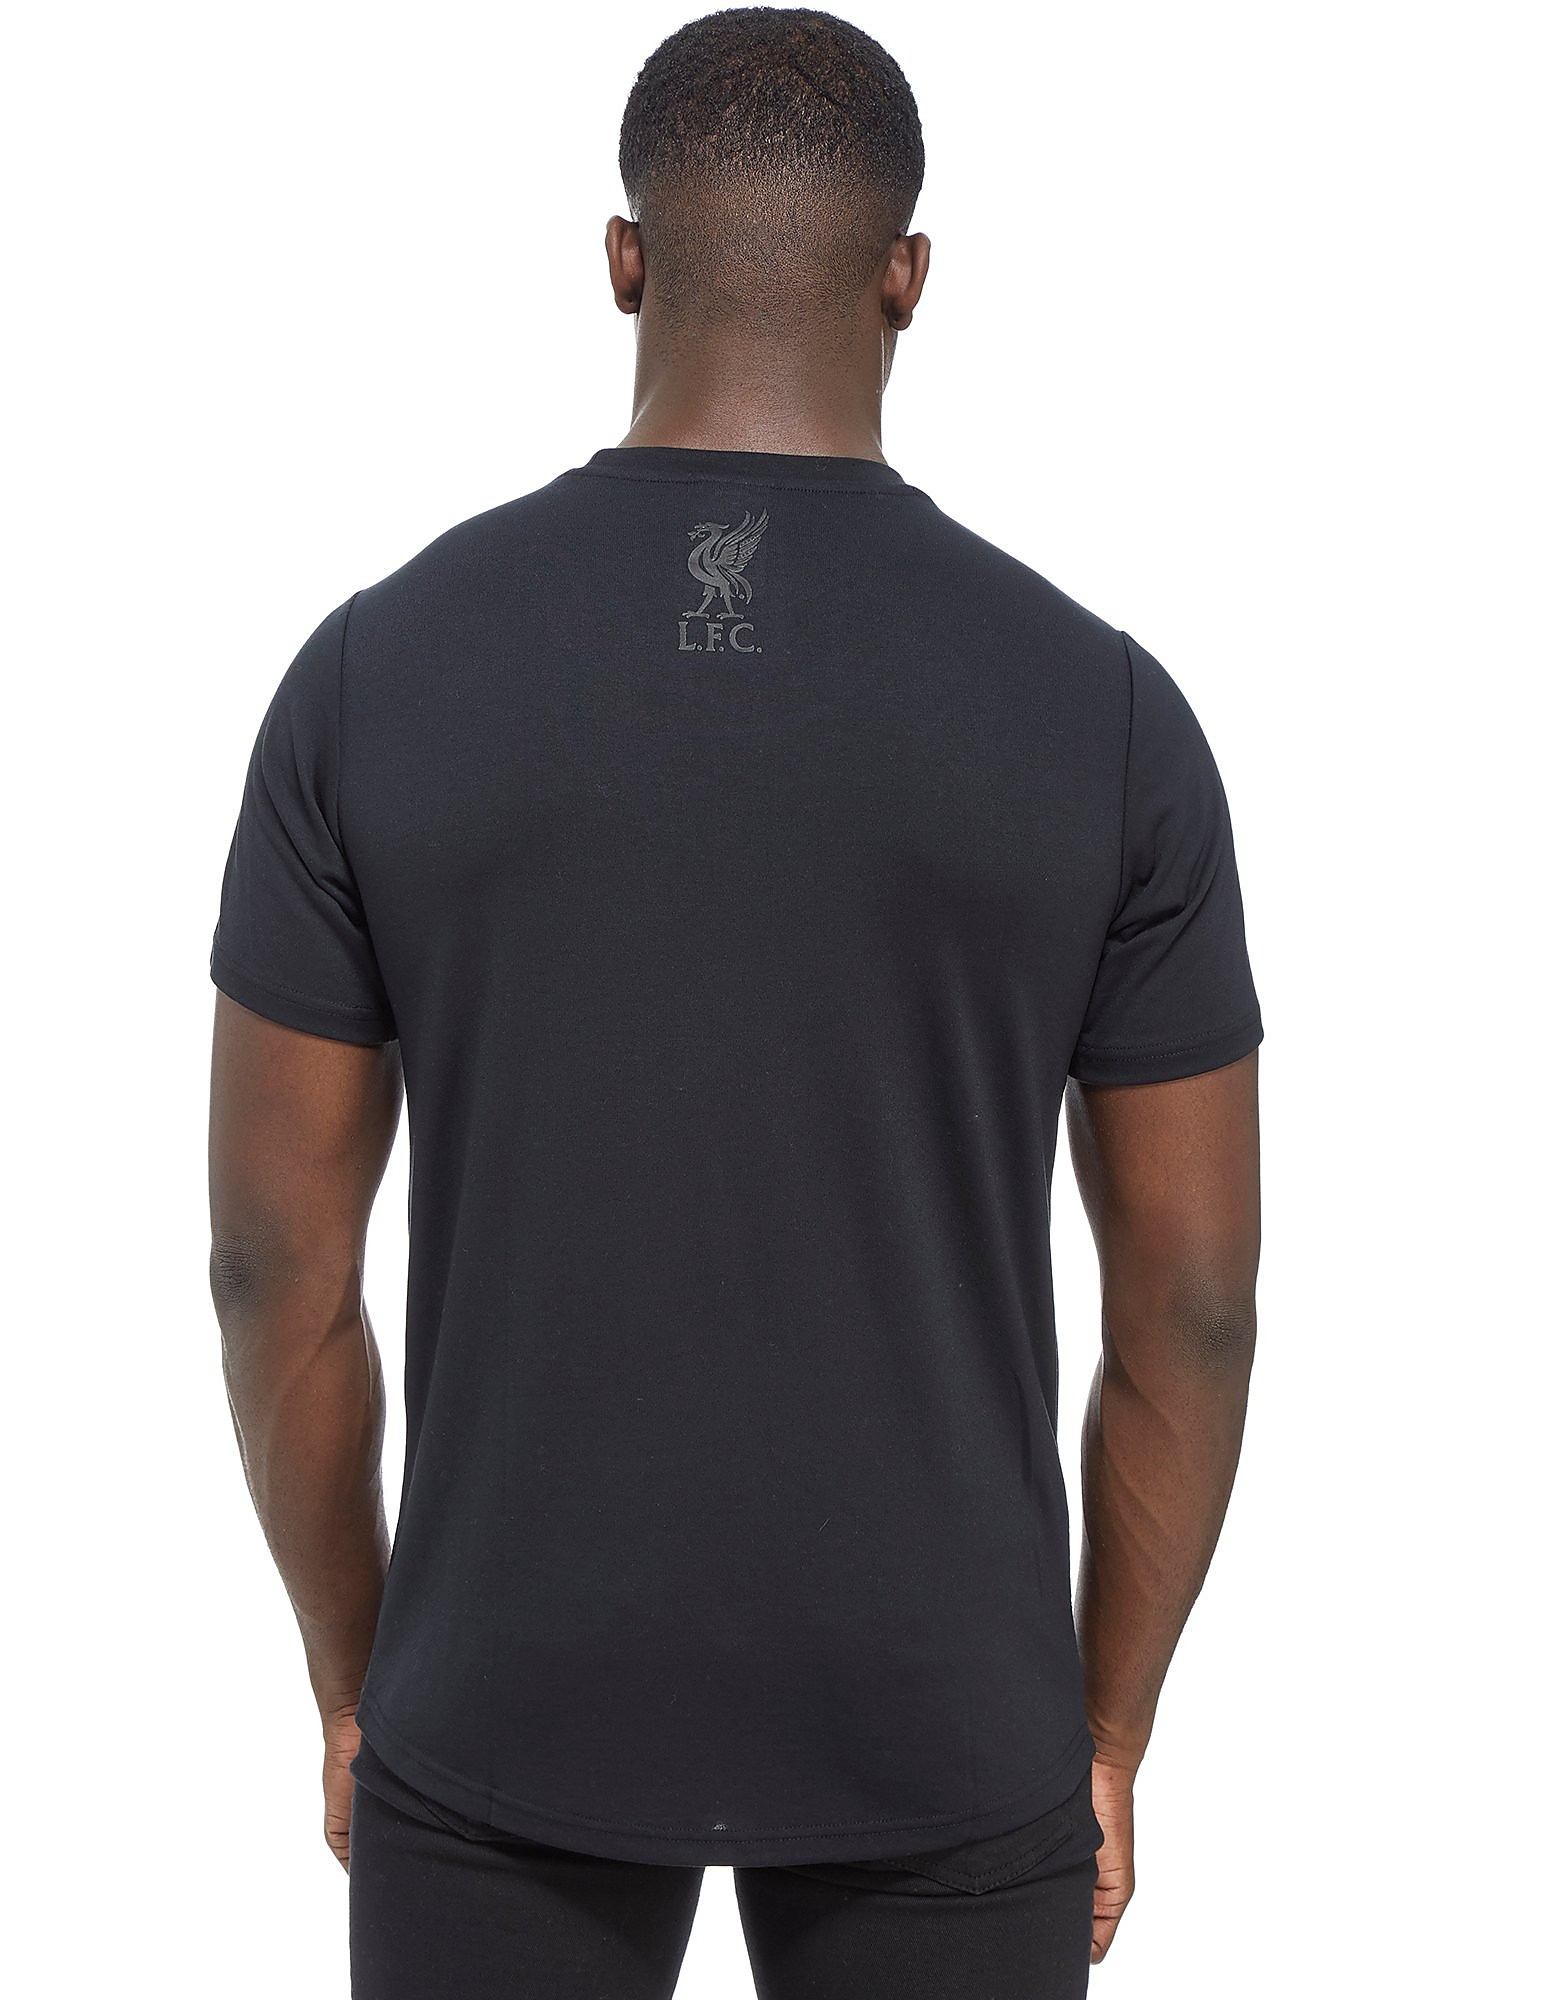 New Balance 247 Liverpool FC Pitch T-Shirt